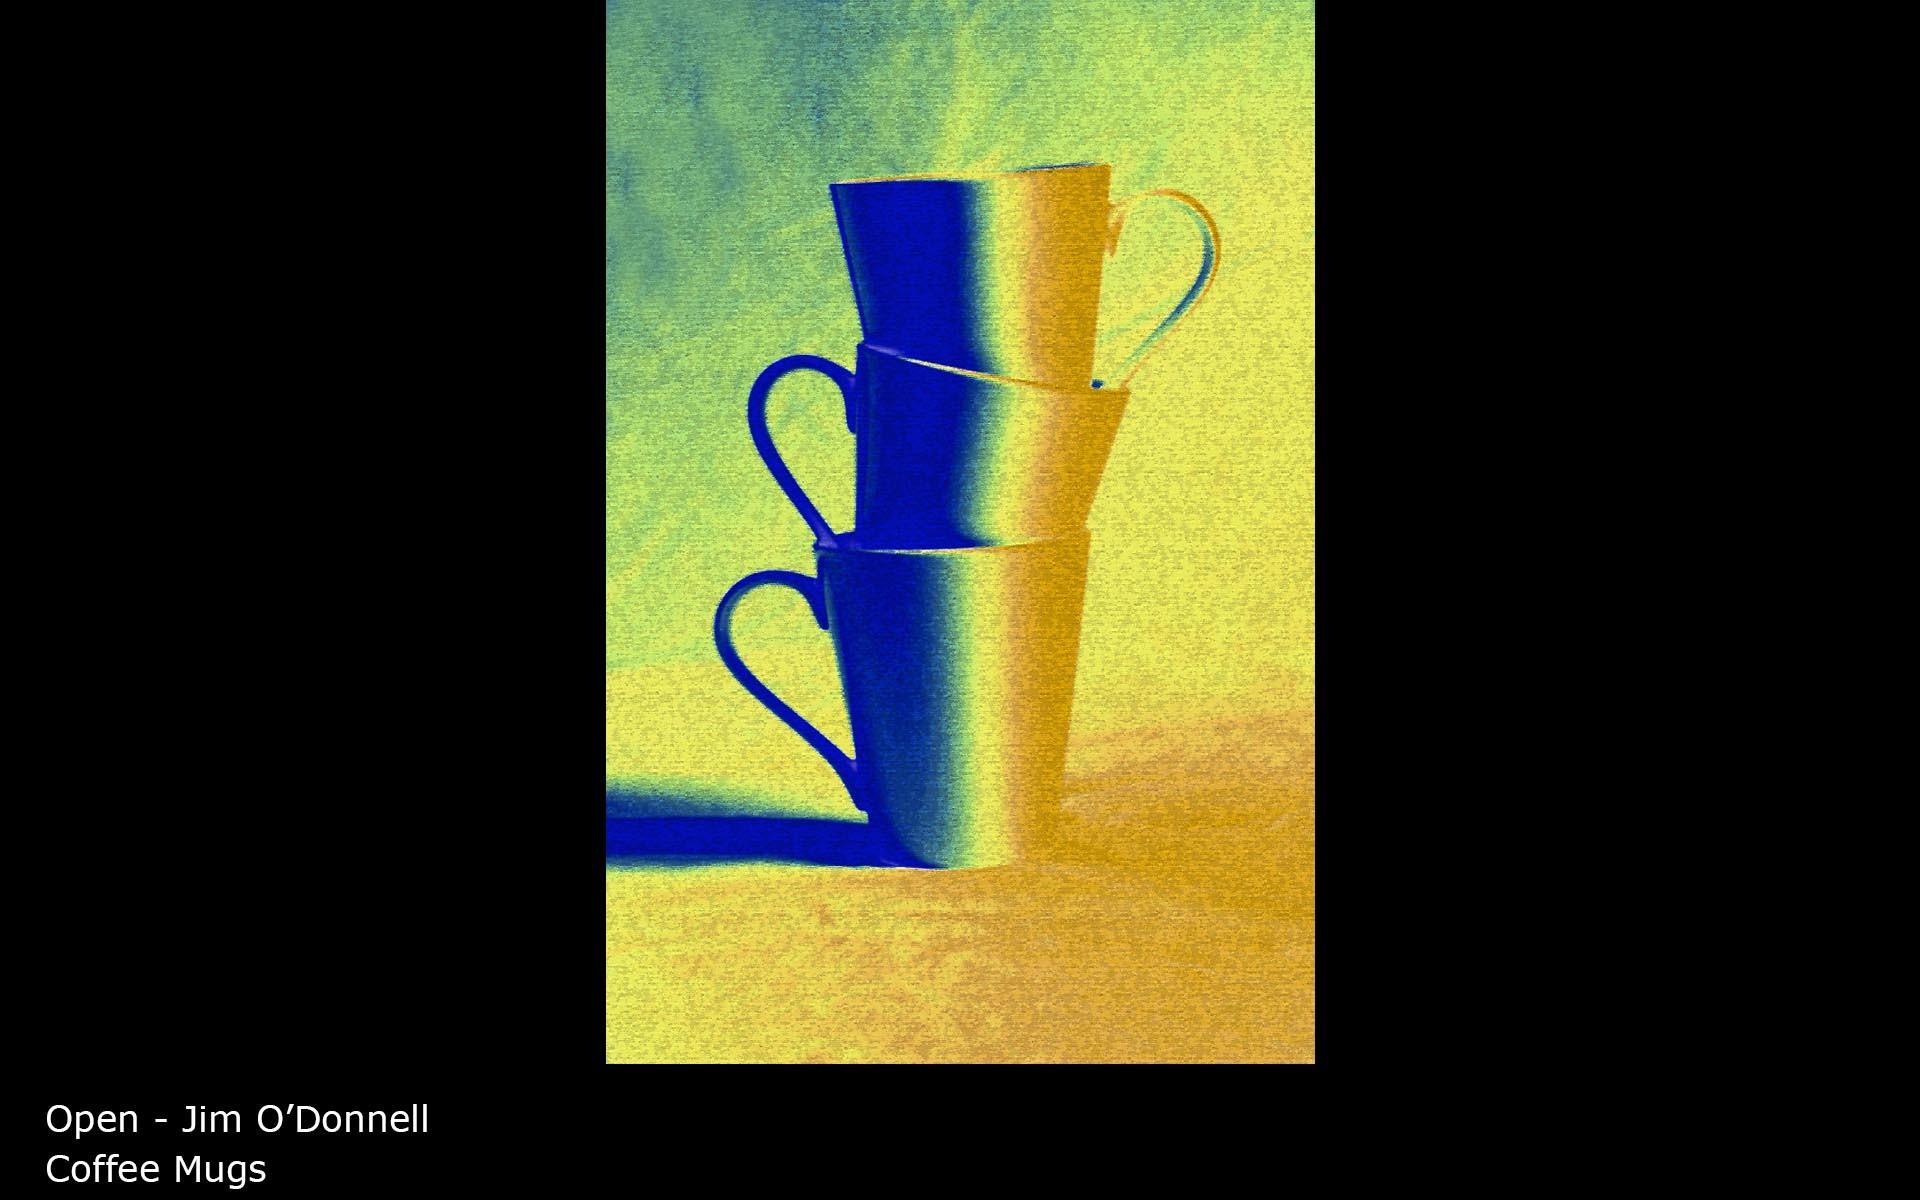 Coffee Mugs - Jim O'Donnell